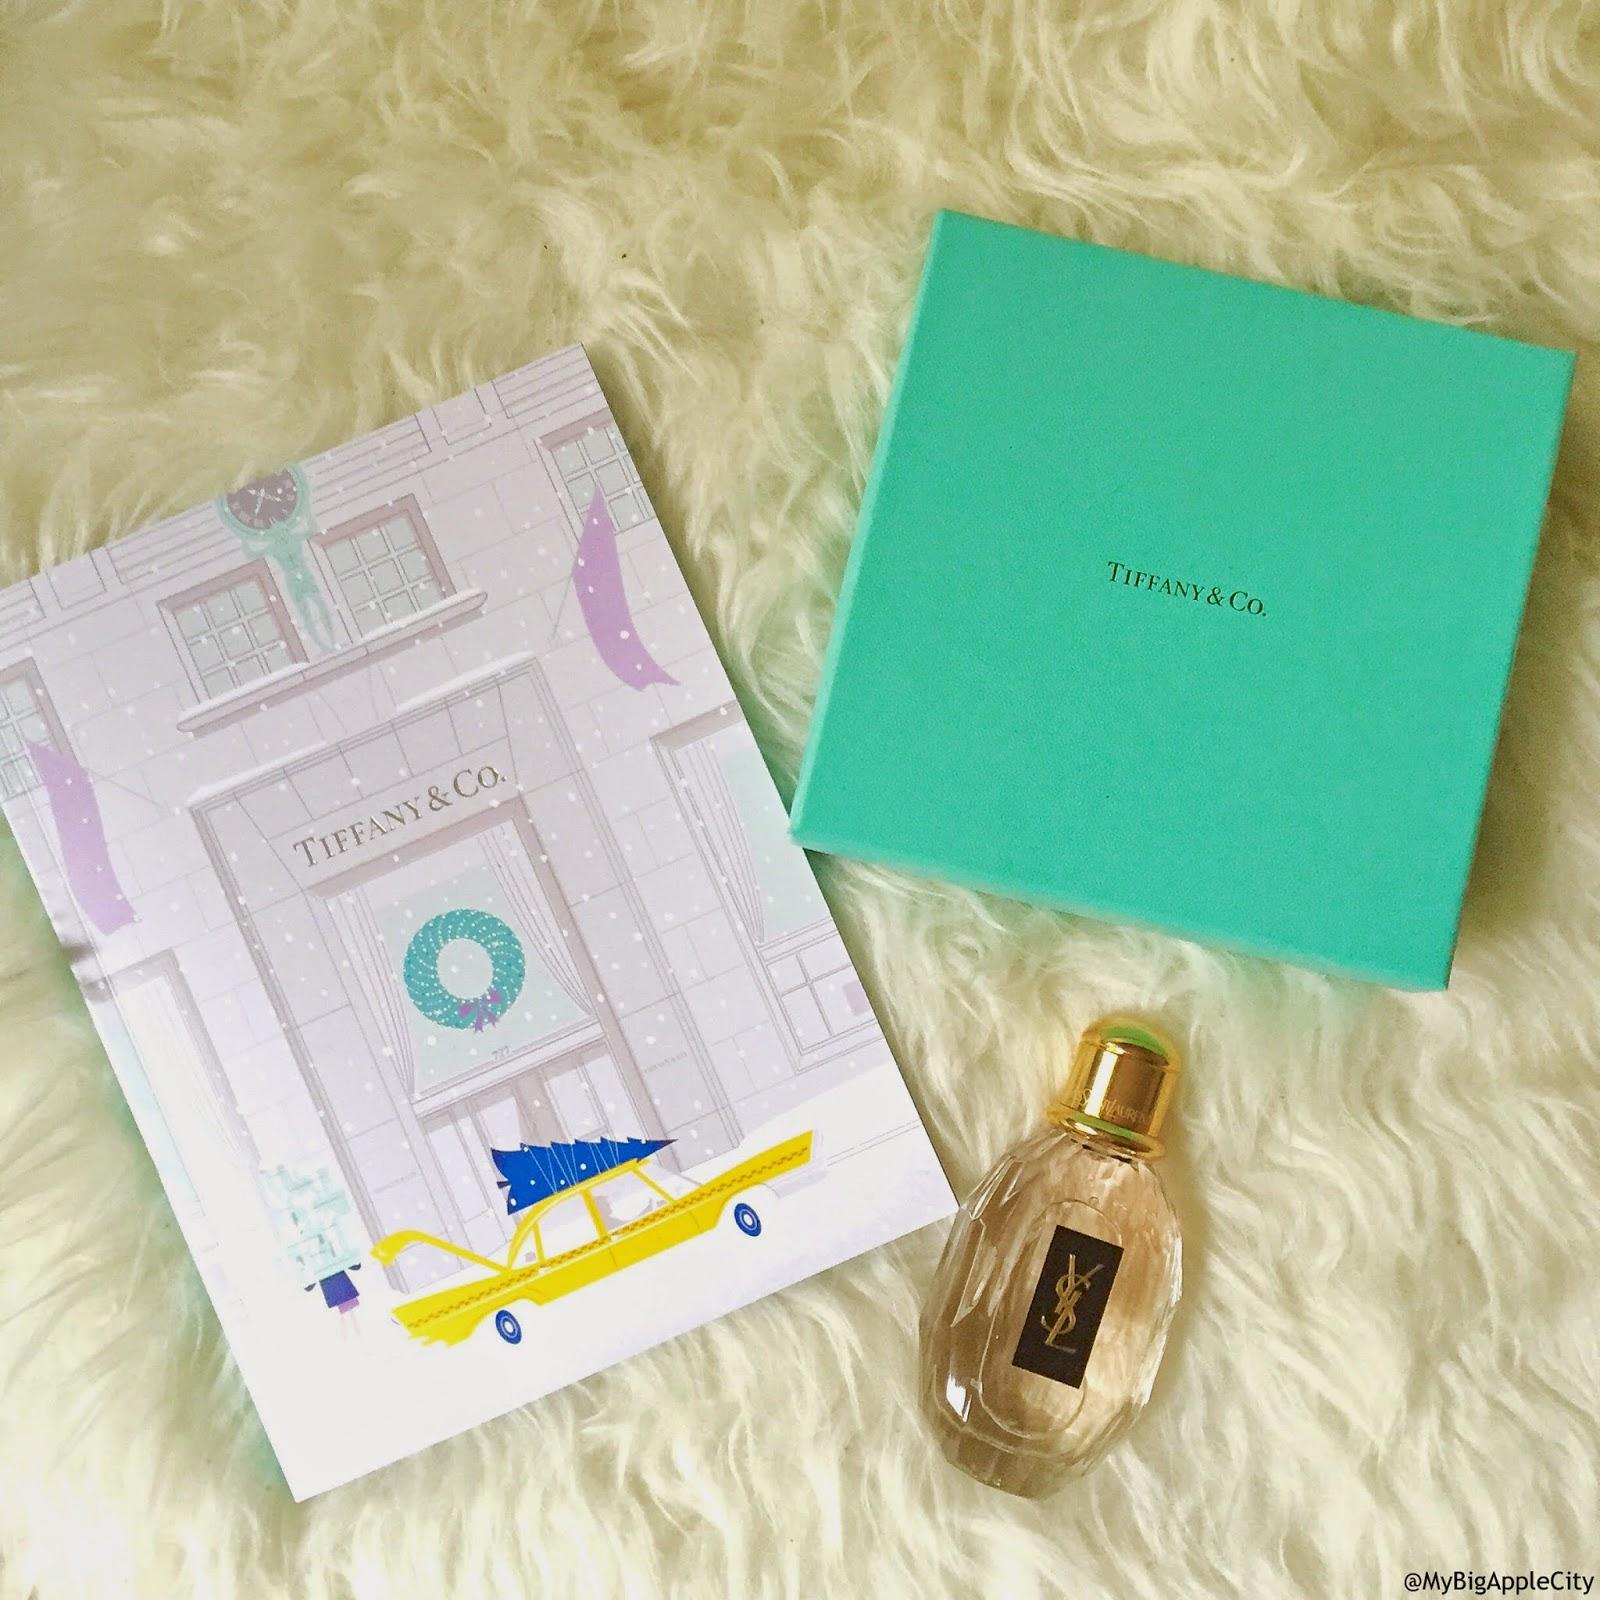 tiffany-catalog-christmas-lifestyle-nyc-blogger